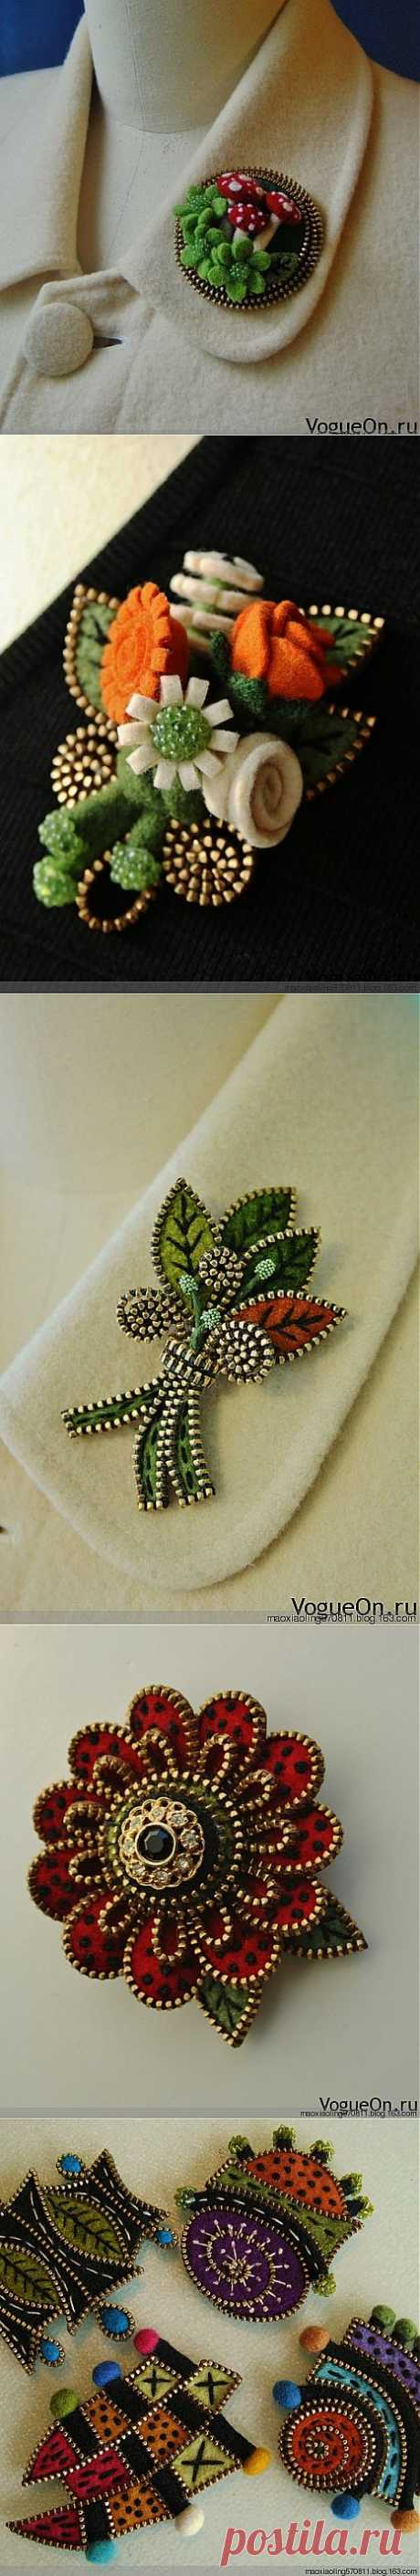 19 Ways to Make Felted Zipper Brooch   www.FabArtDIY.com